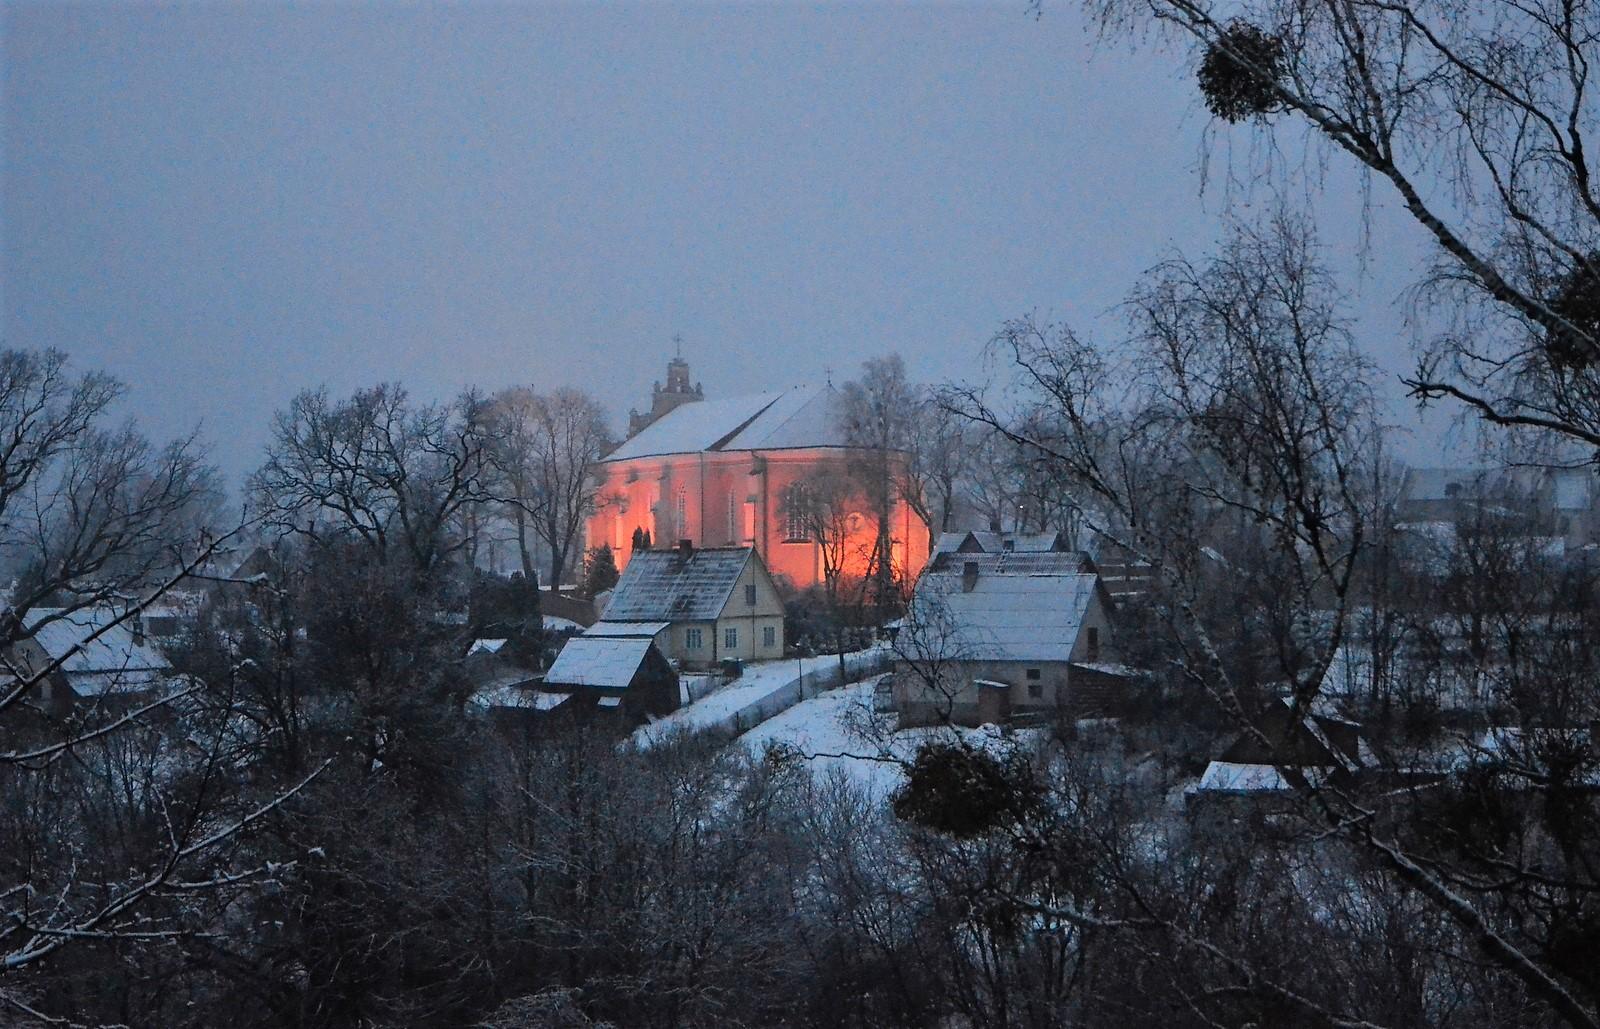 Apšviesta bažnyčia žiemos peizaže.